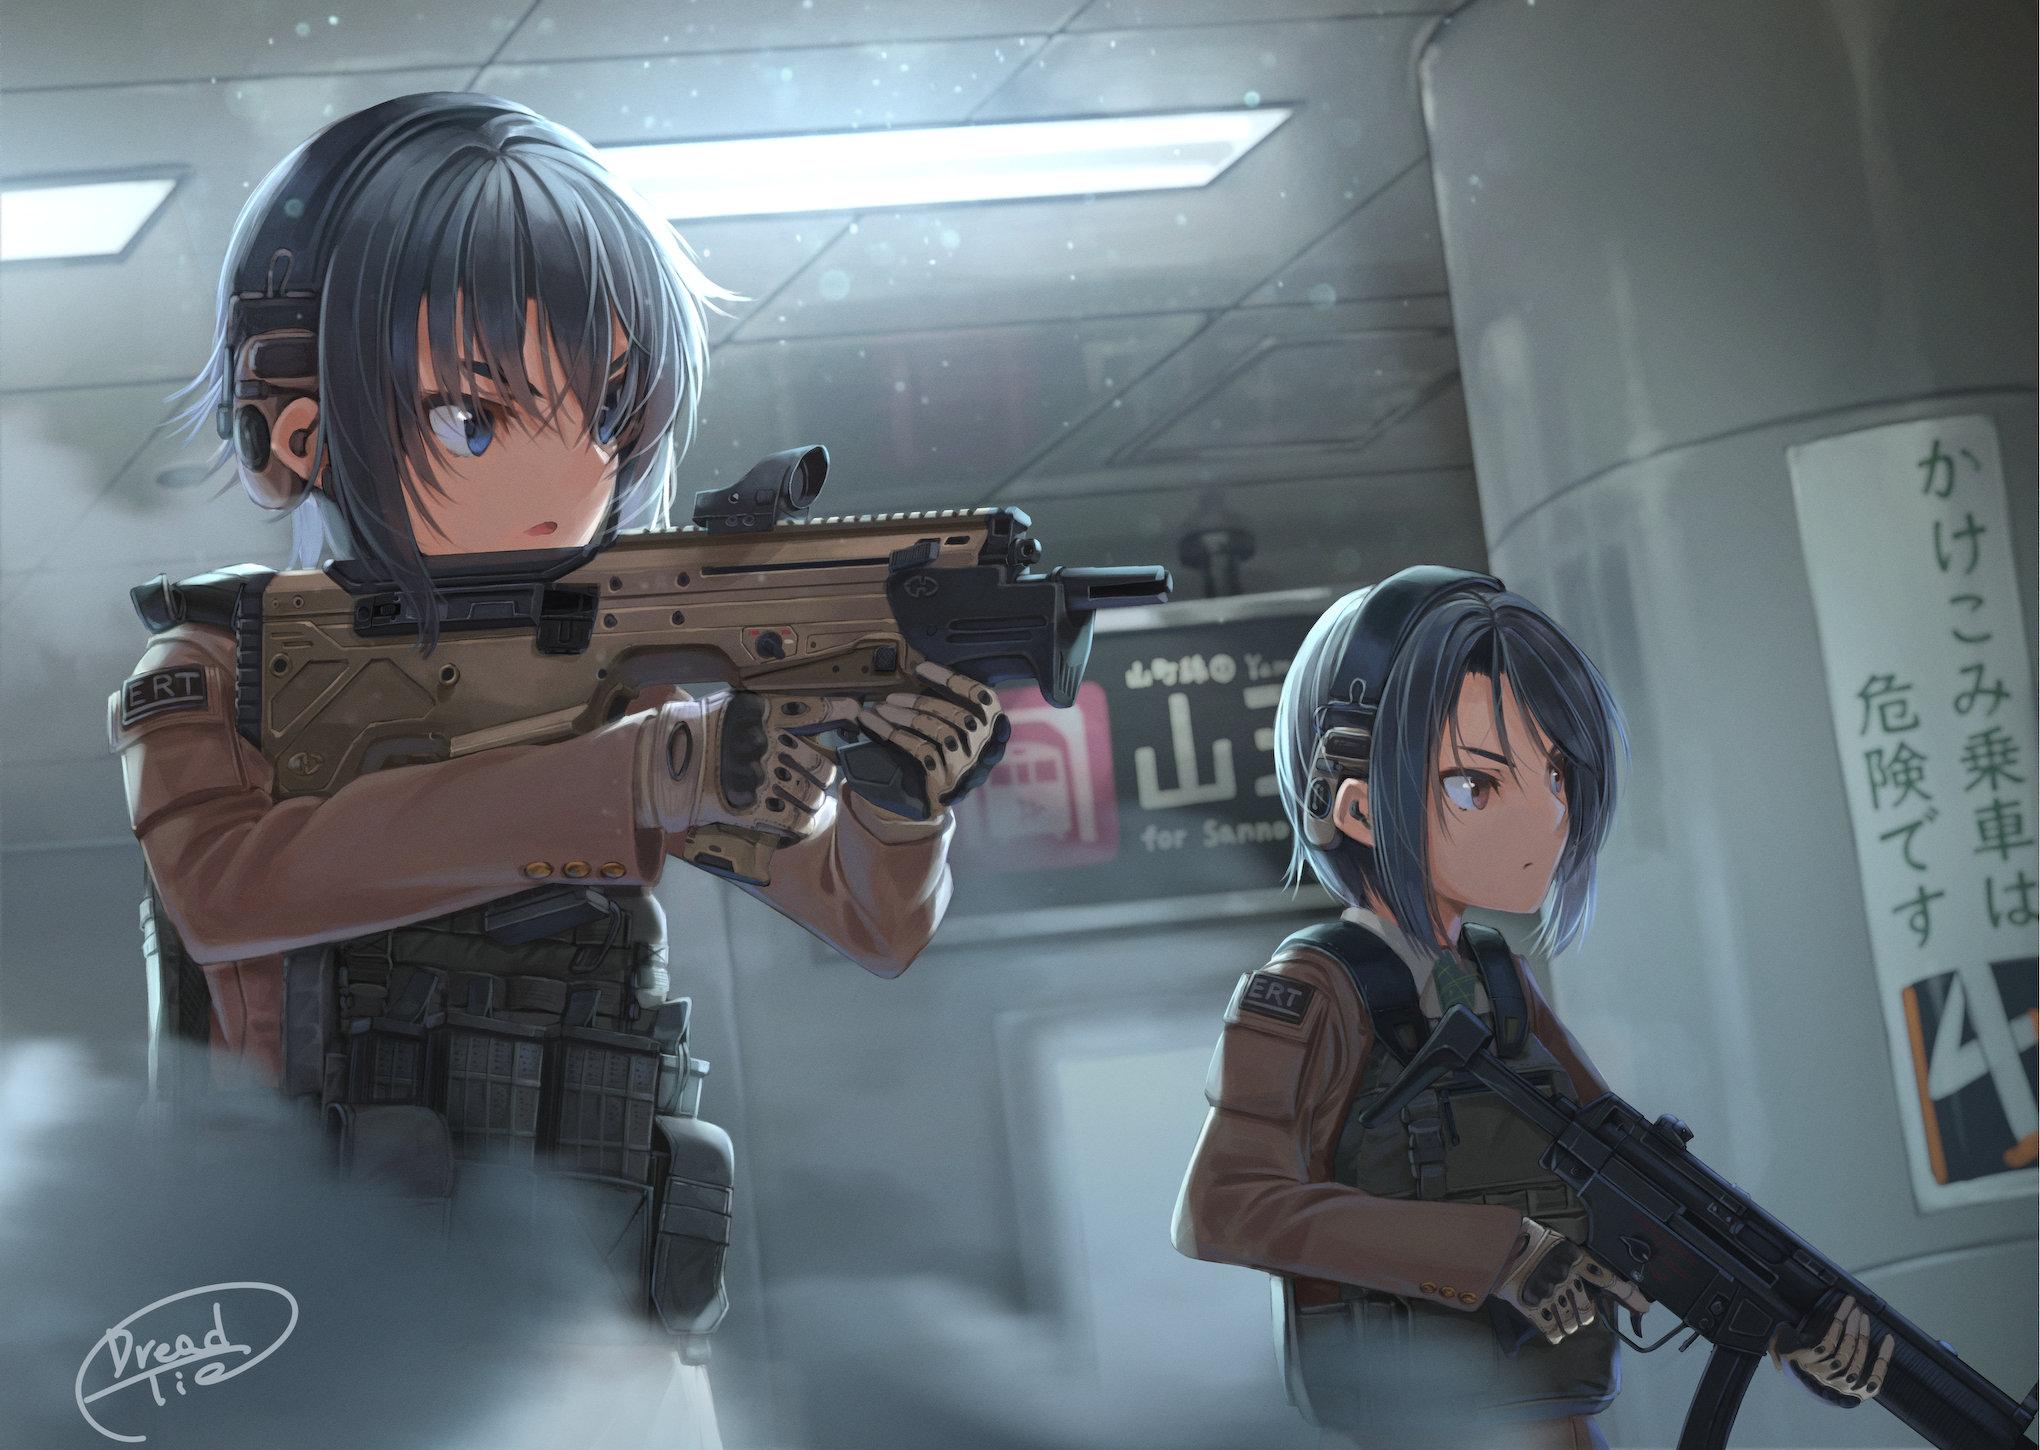 Anime 2040x1450 anime guns anime anime girls girls with guns machine gun two women dark hair blue eyes weapon